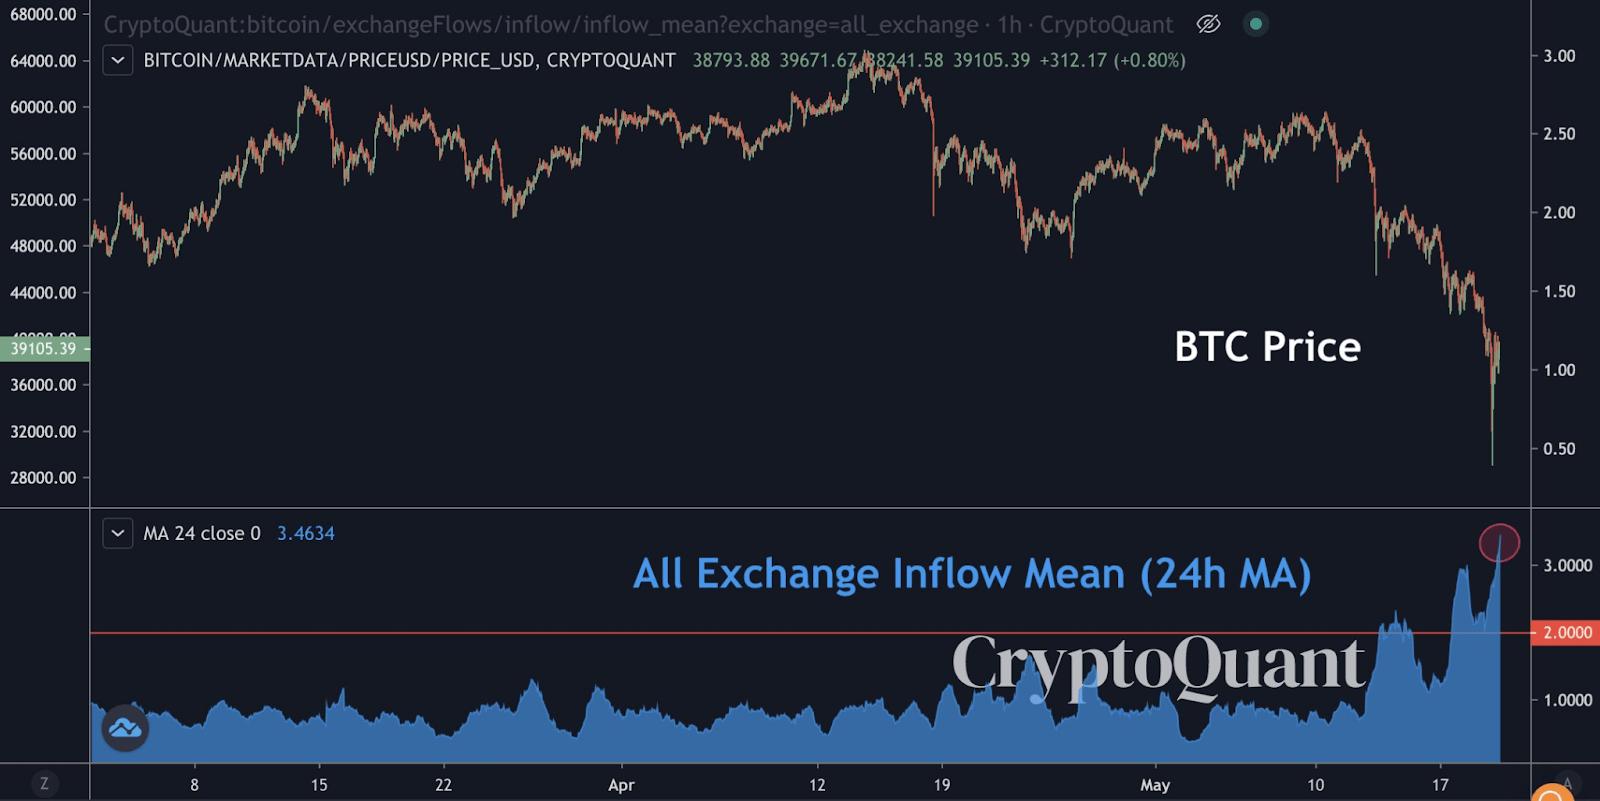 Bitcoin BTC Exchanges Inflow Mean